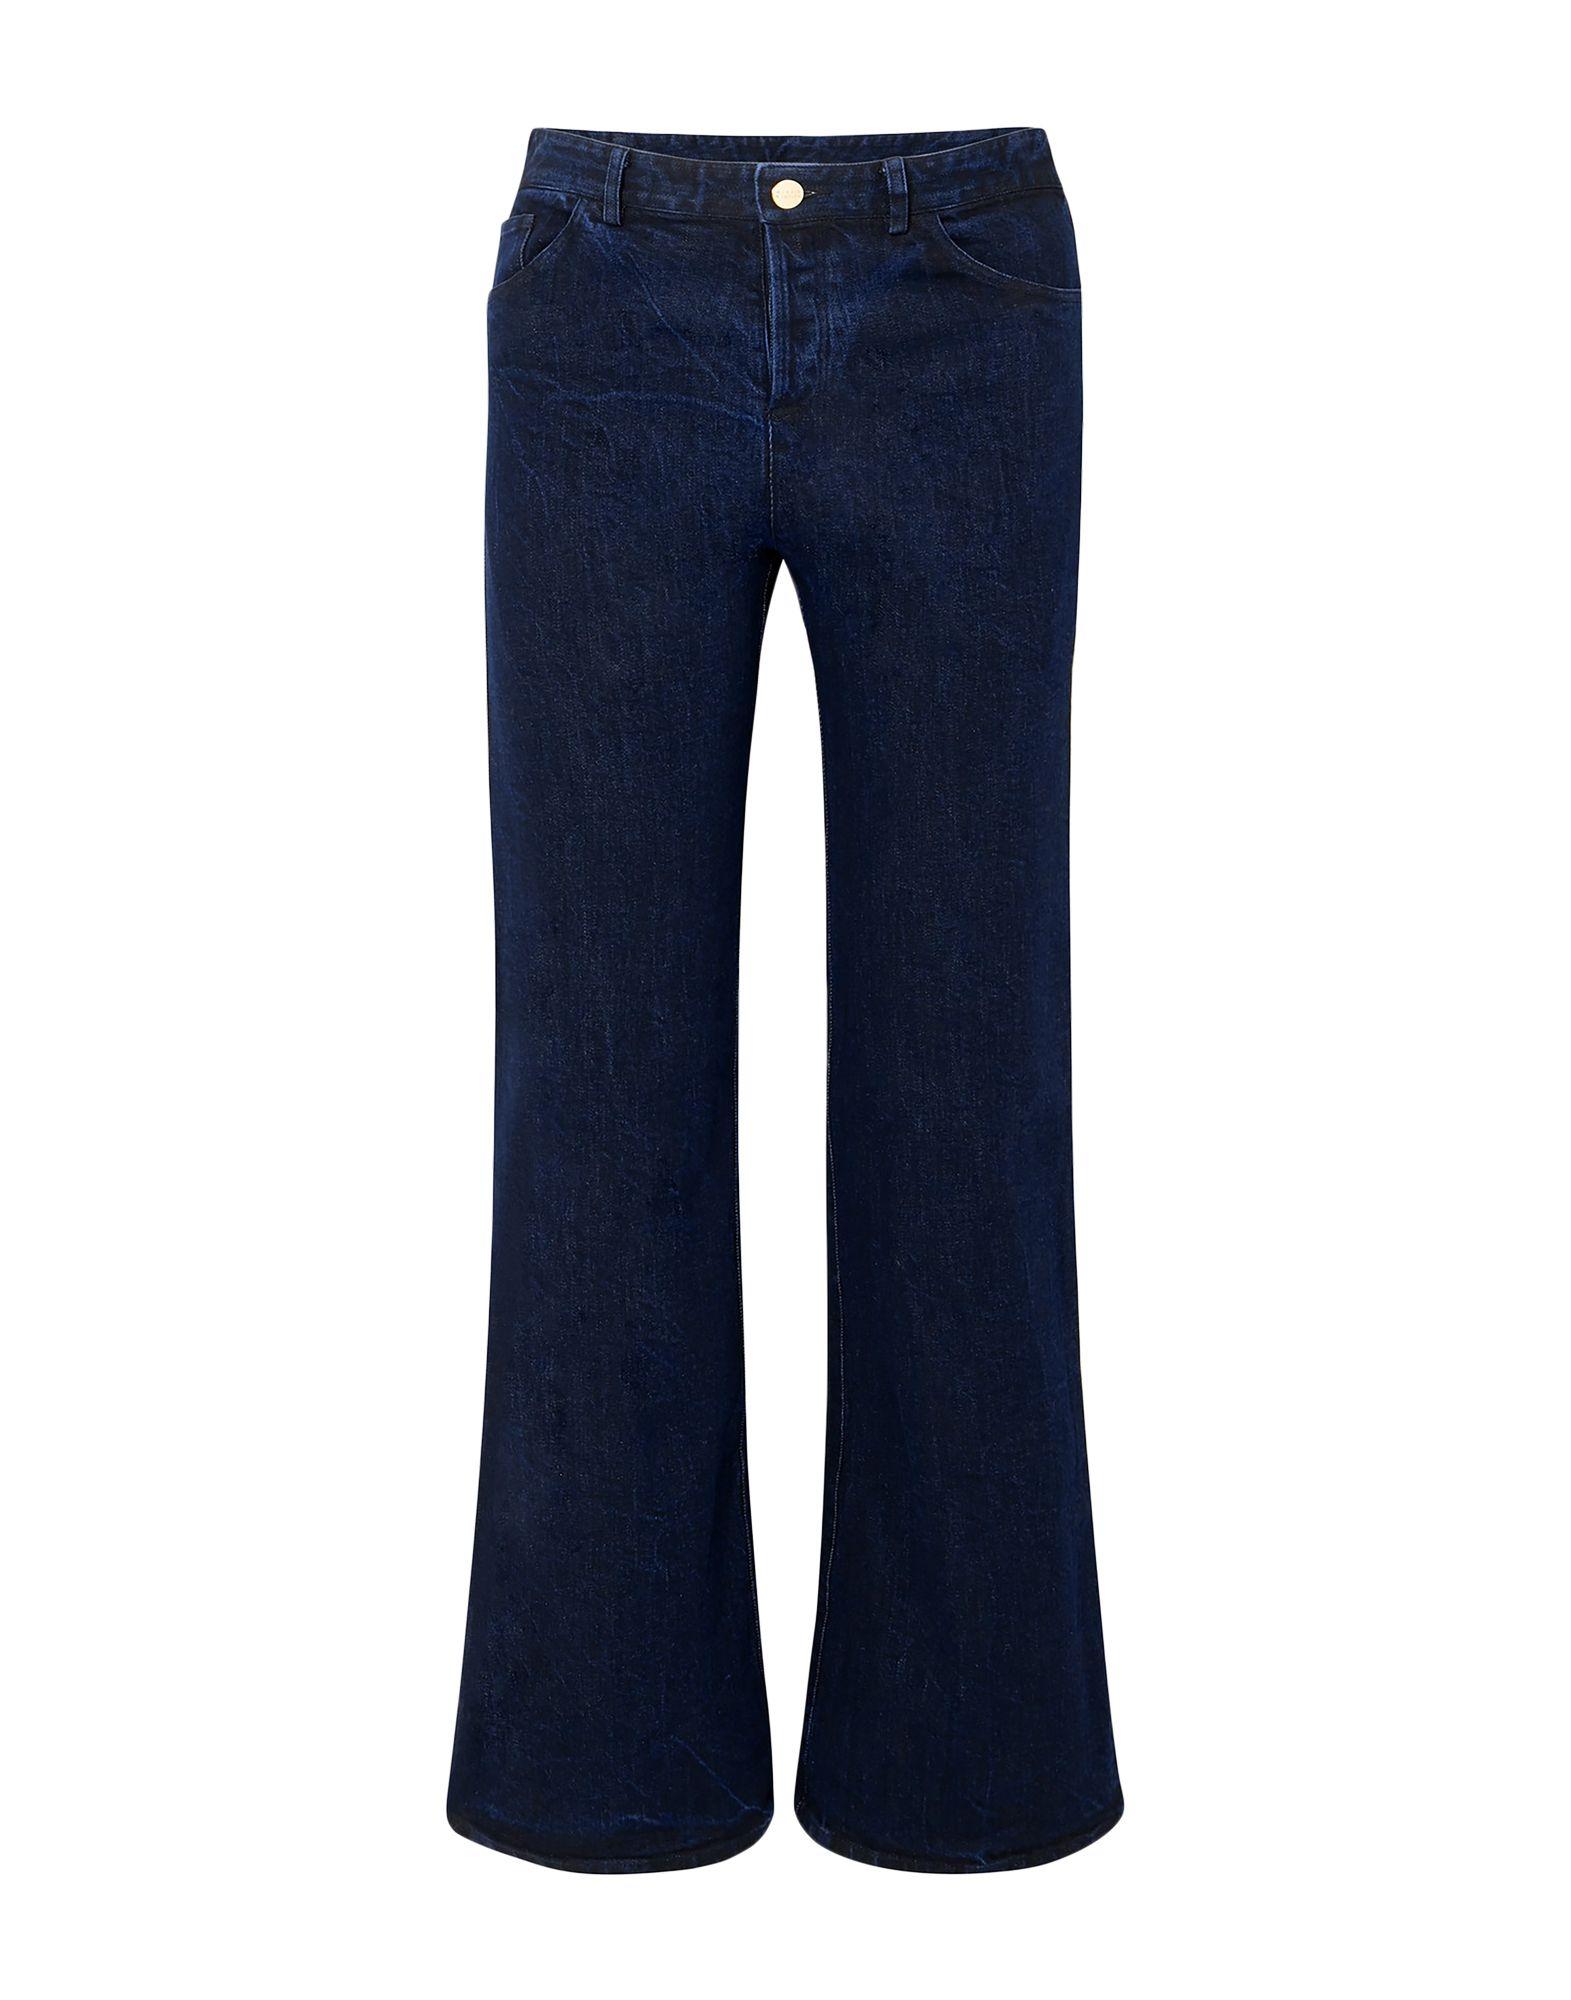 maggie marilyn футболка MAGGIE MARILYN Джинсовые брюки